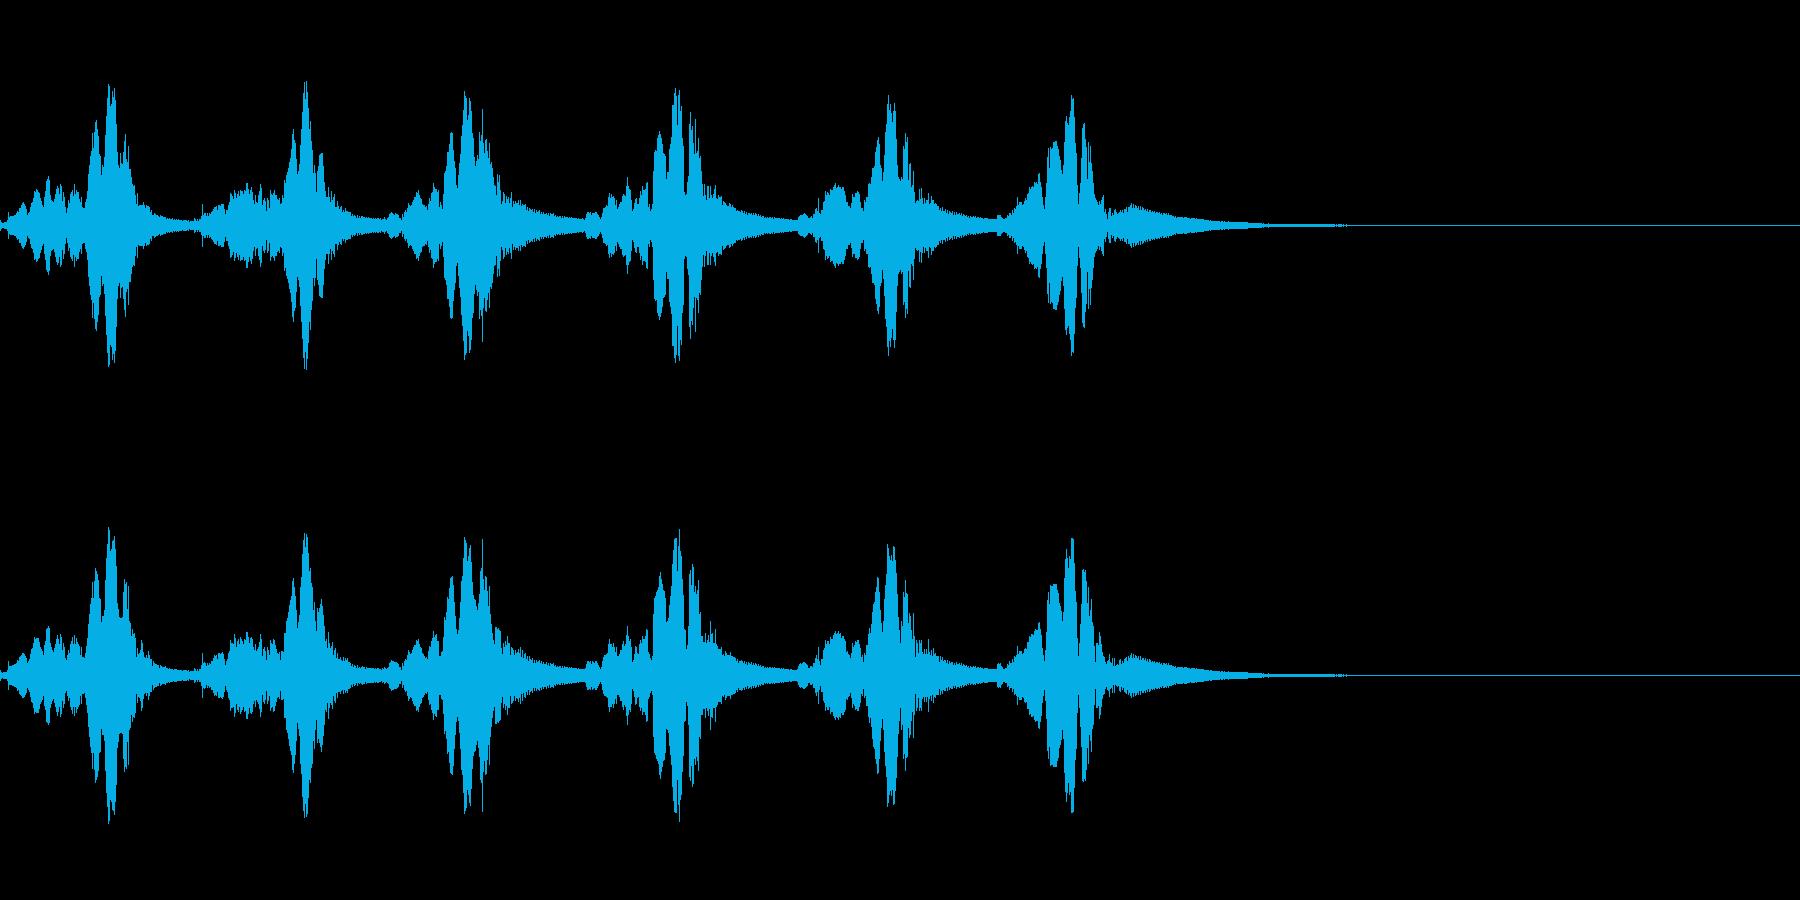 KANTピヨピヨ自主規制音7shortの再生済みの波形